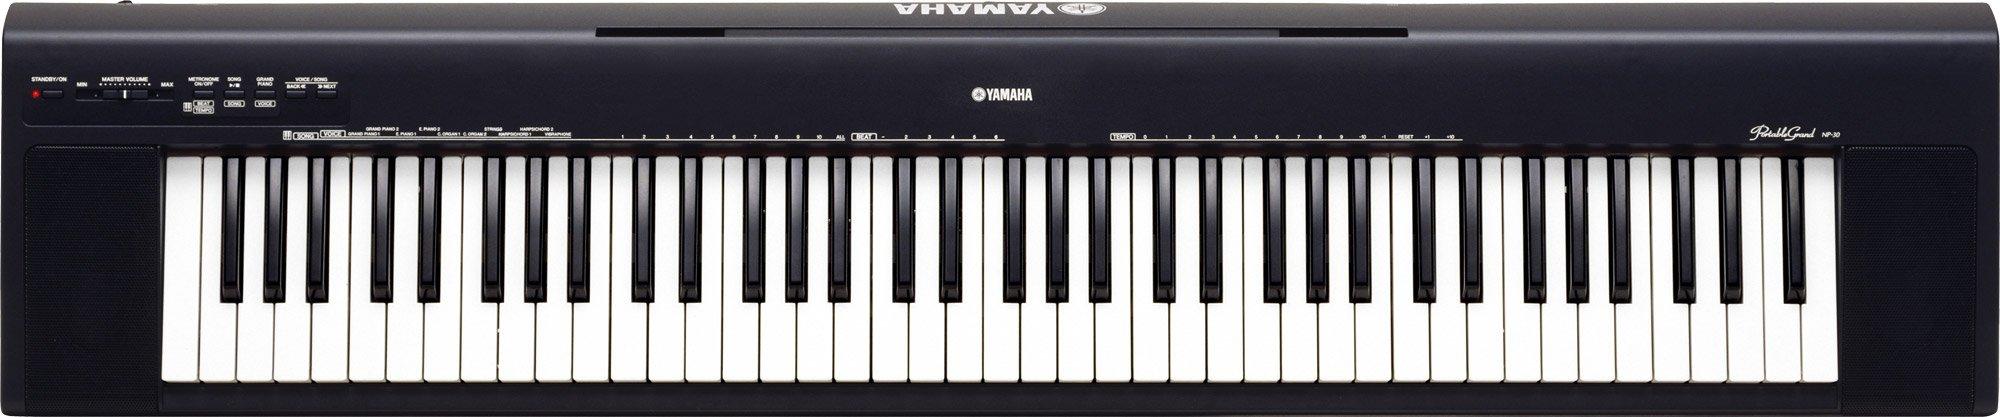 yamaha np 30 portable grand keyboard inc gigbag and power. Black Bedroom Furniture Sets. Home Design Ideas